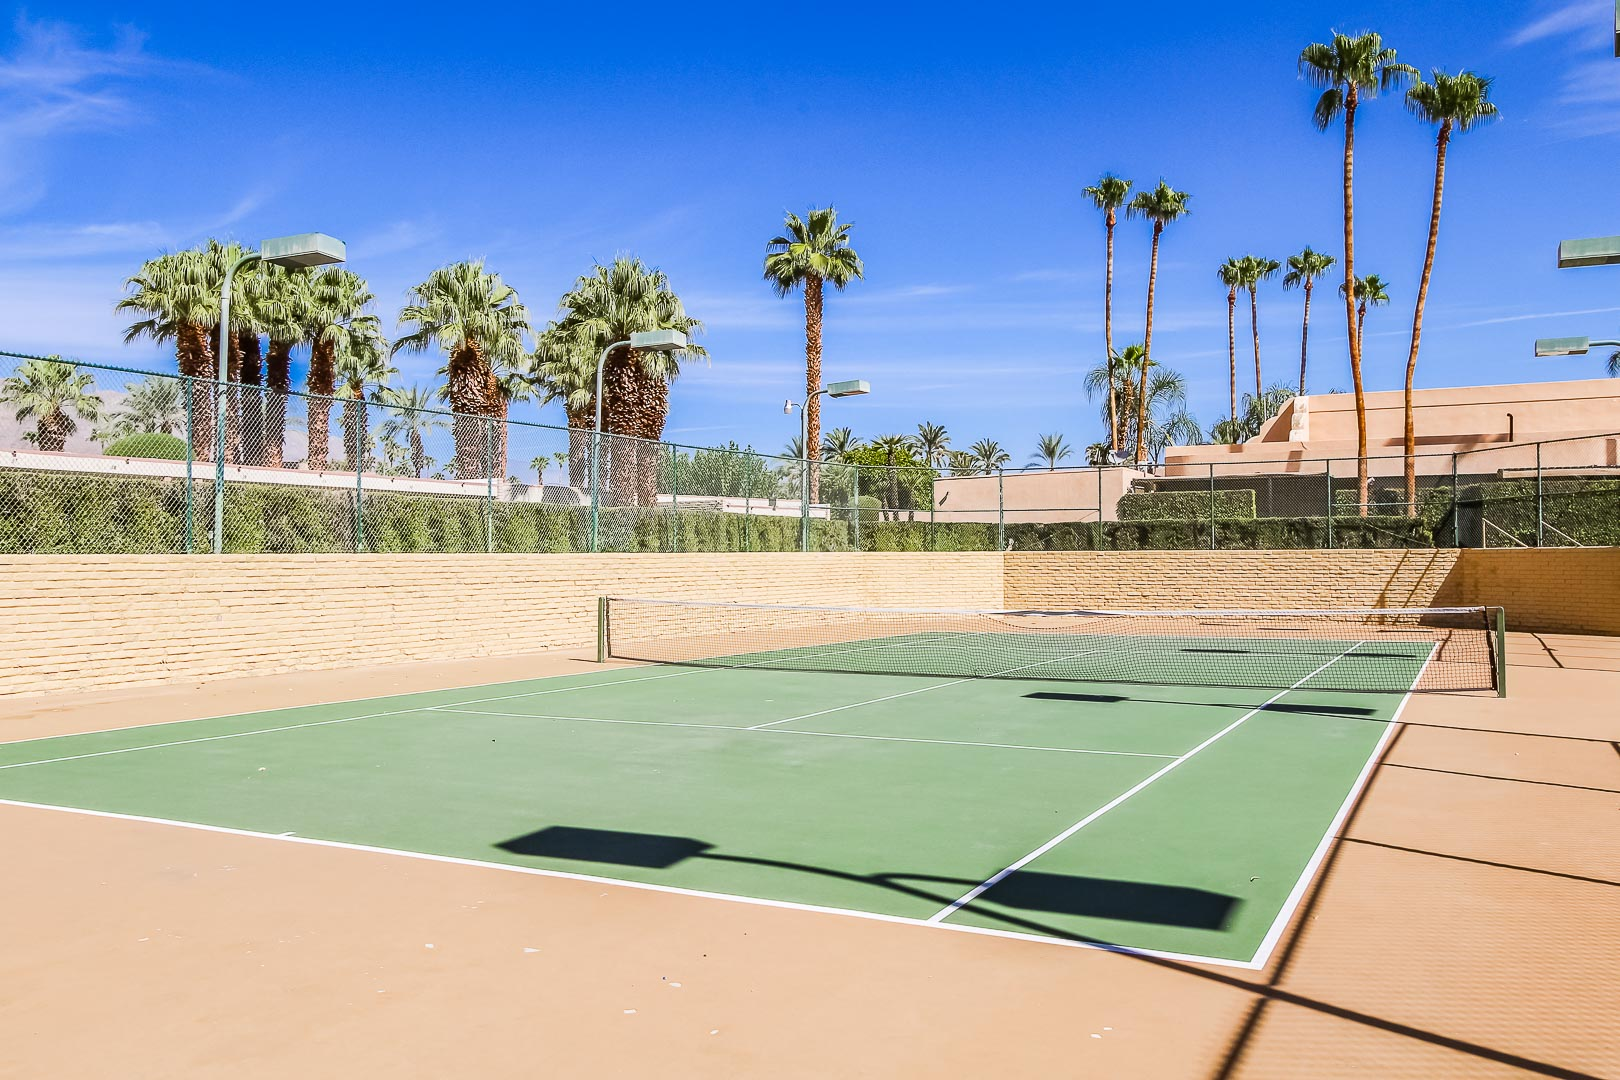 Large outside tennis courts at VRI's Desert Isle Resort in California.